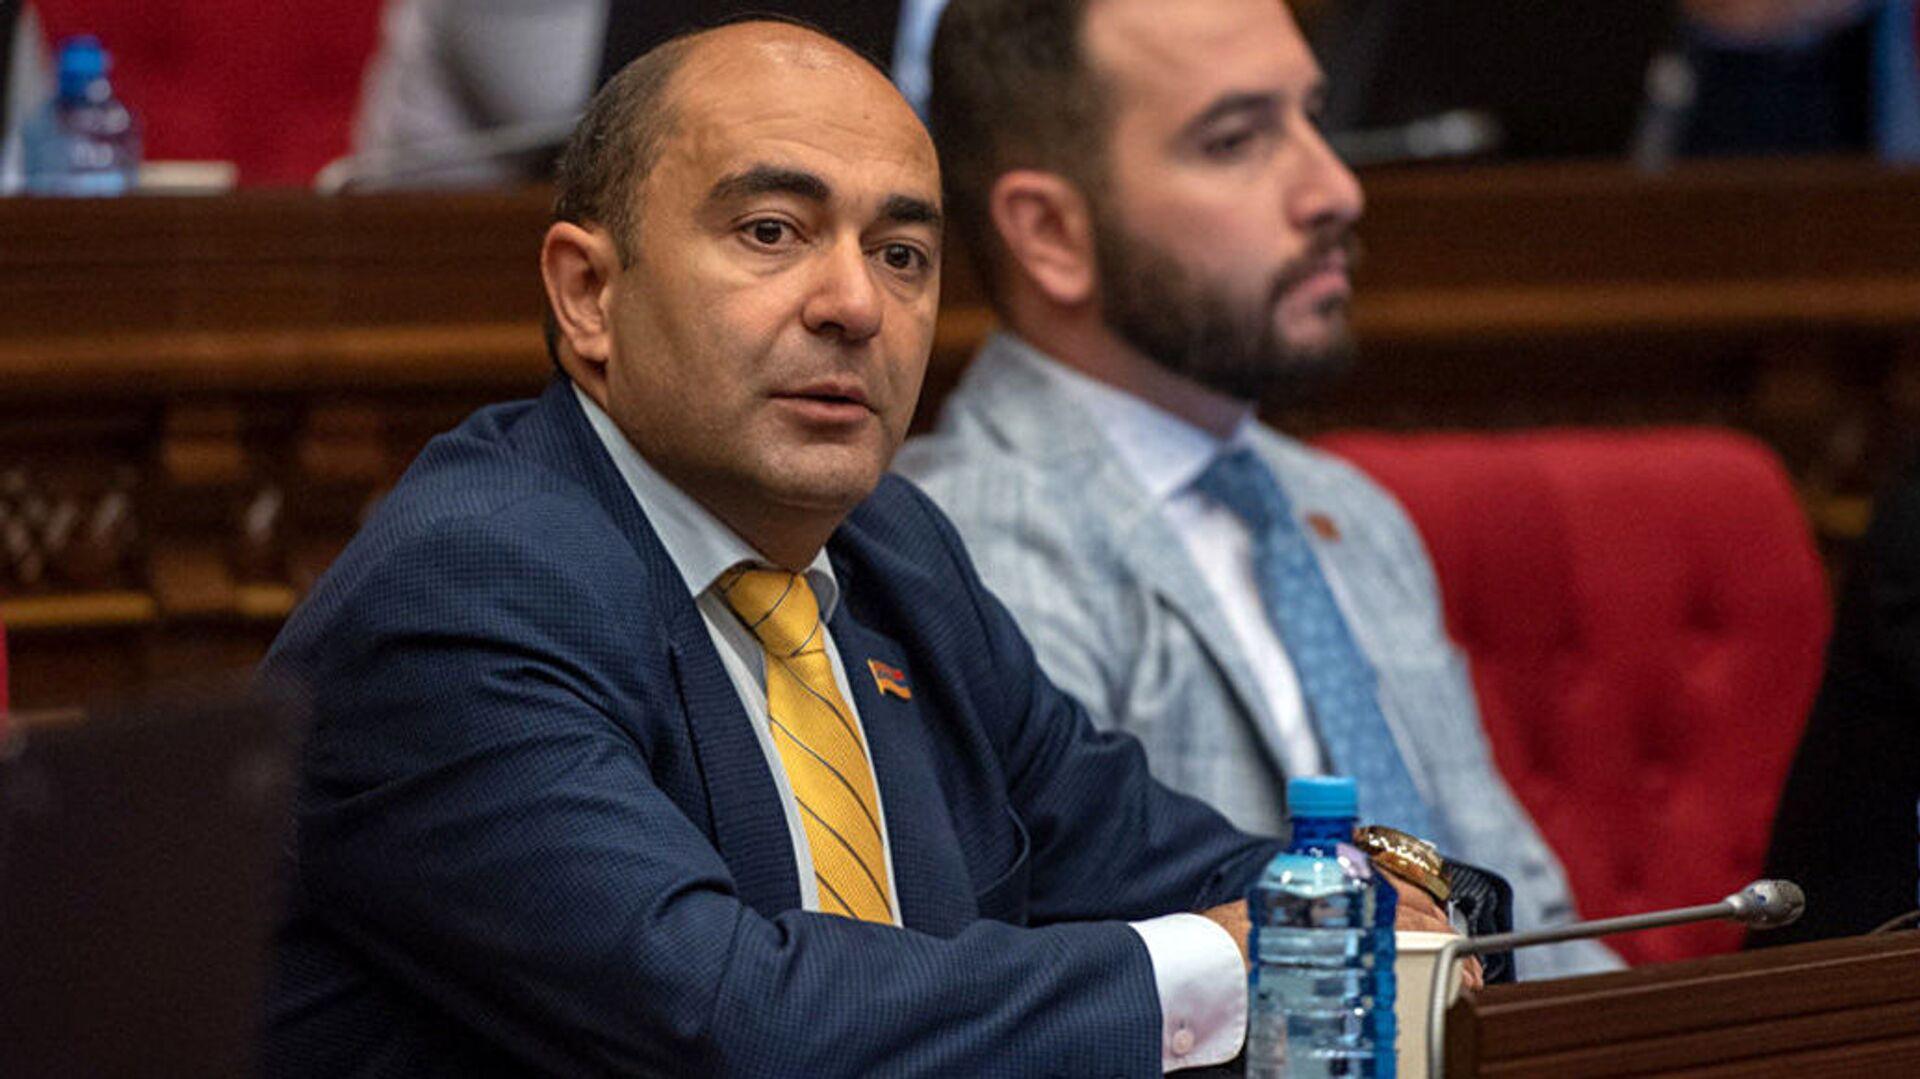 Глава партии Светлая Армения Эдмон Марукян - РИА Новости, 1920, 04.03.2021